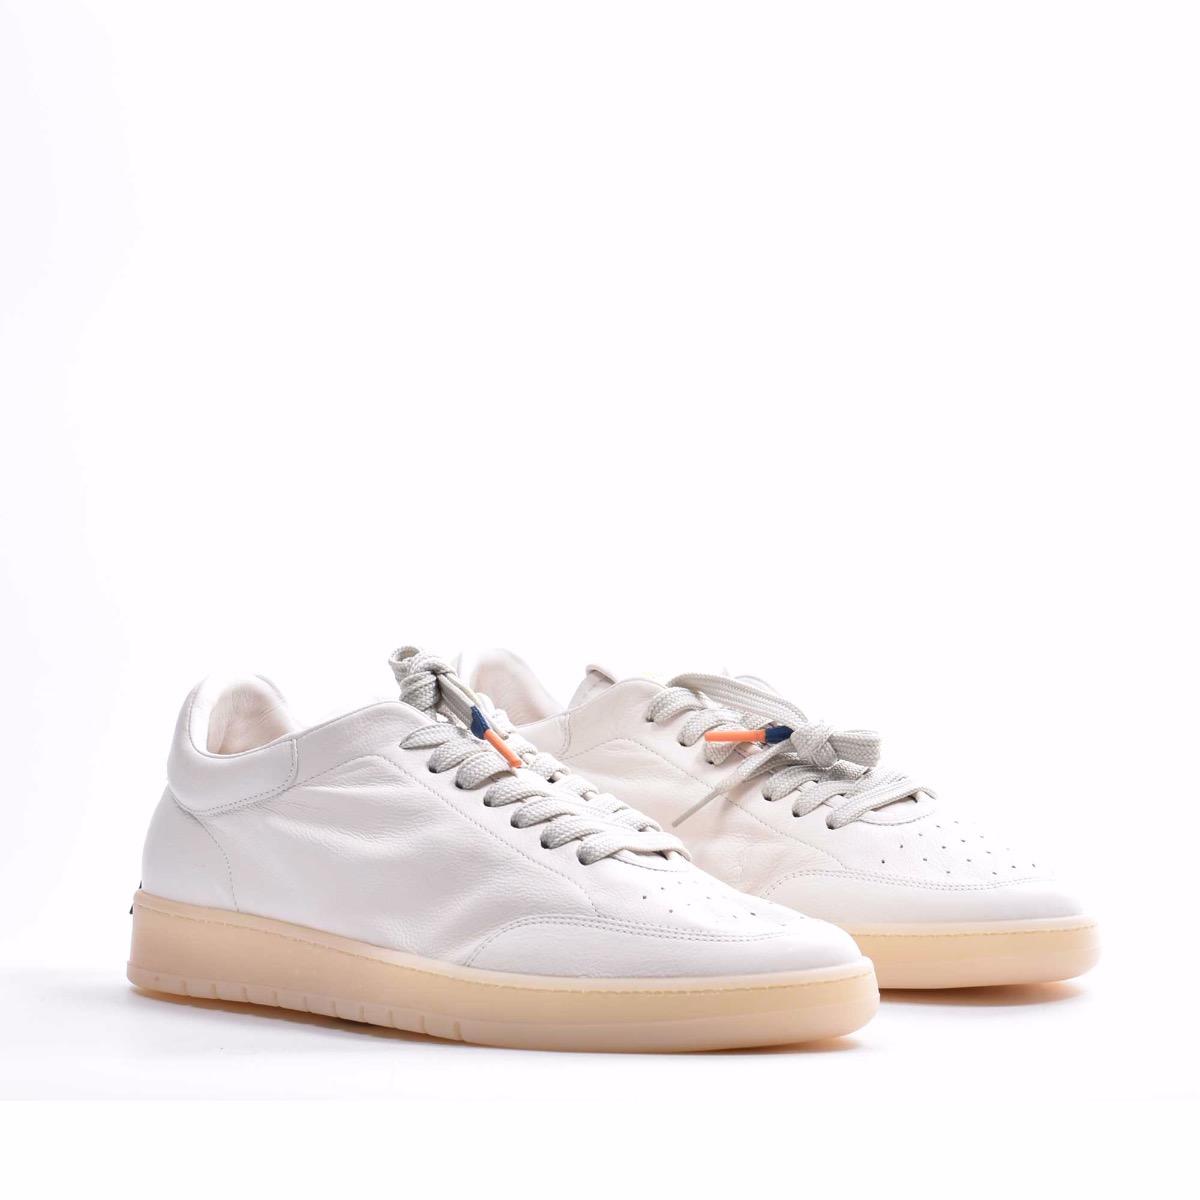 Sneakers ultralight - Panna